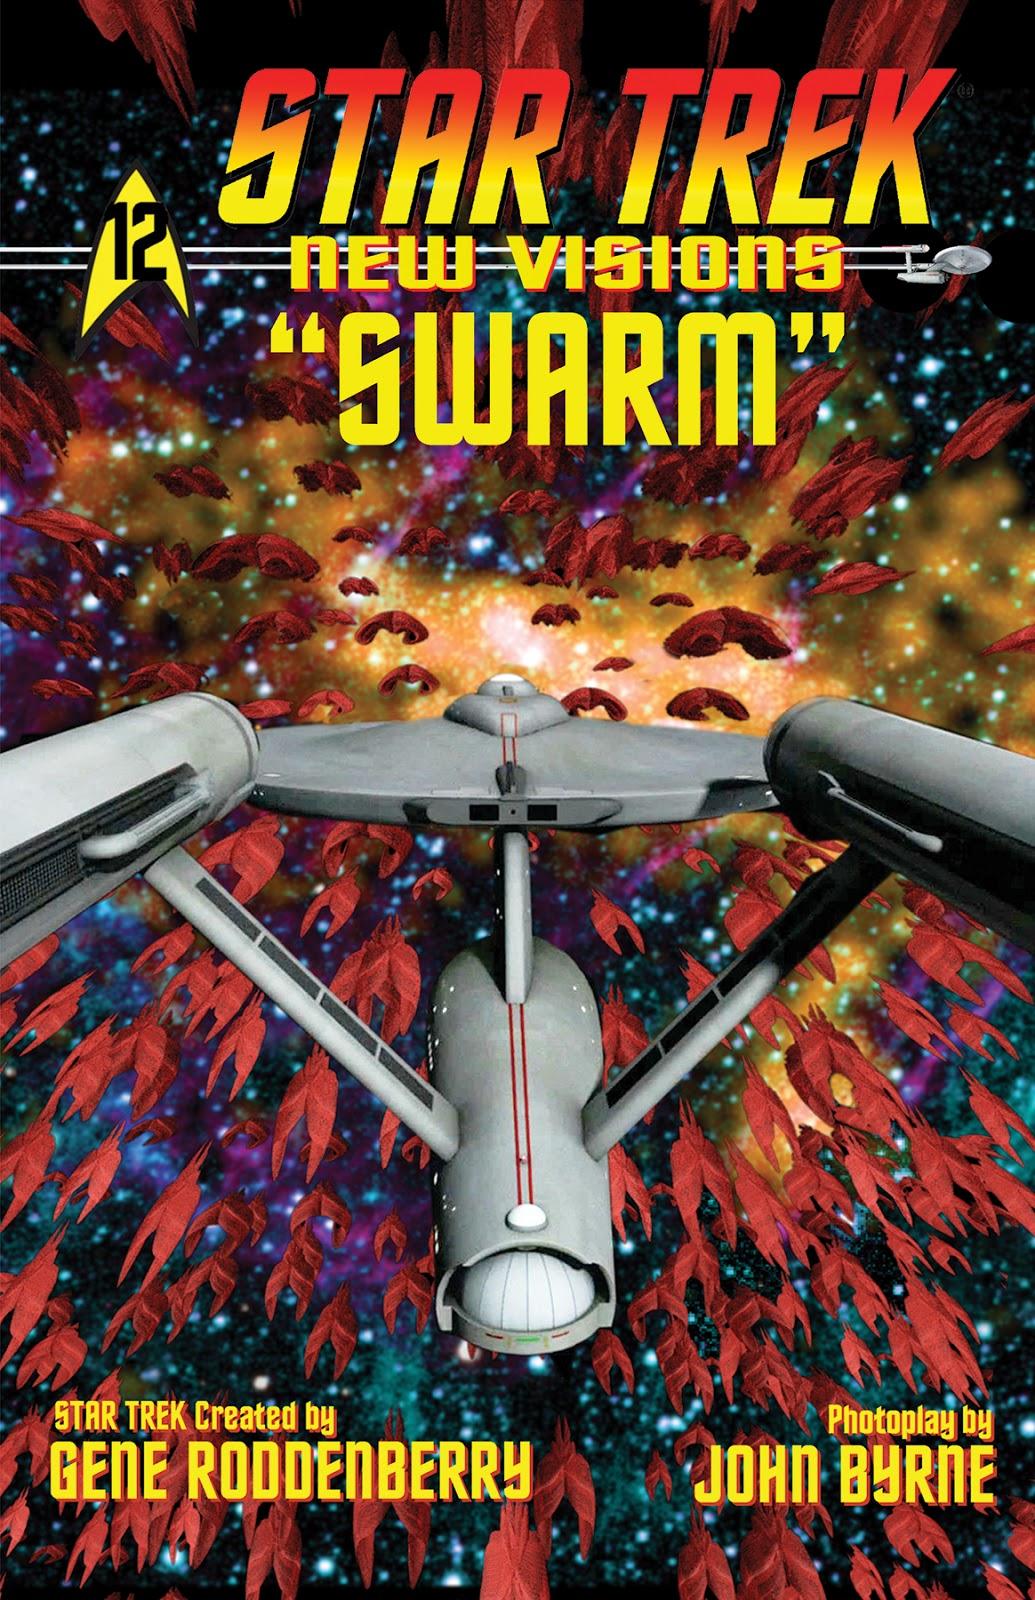 Swarm (comic)